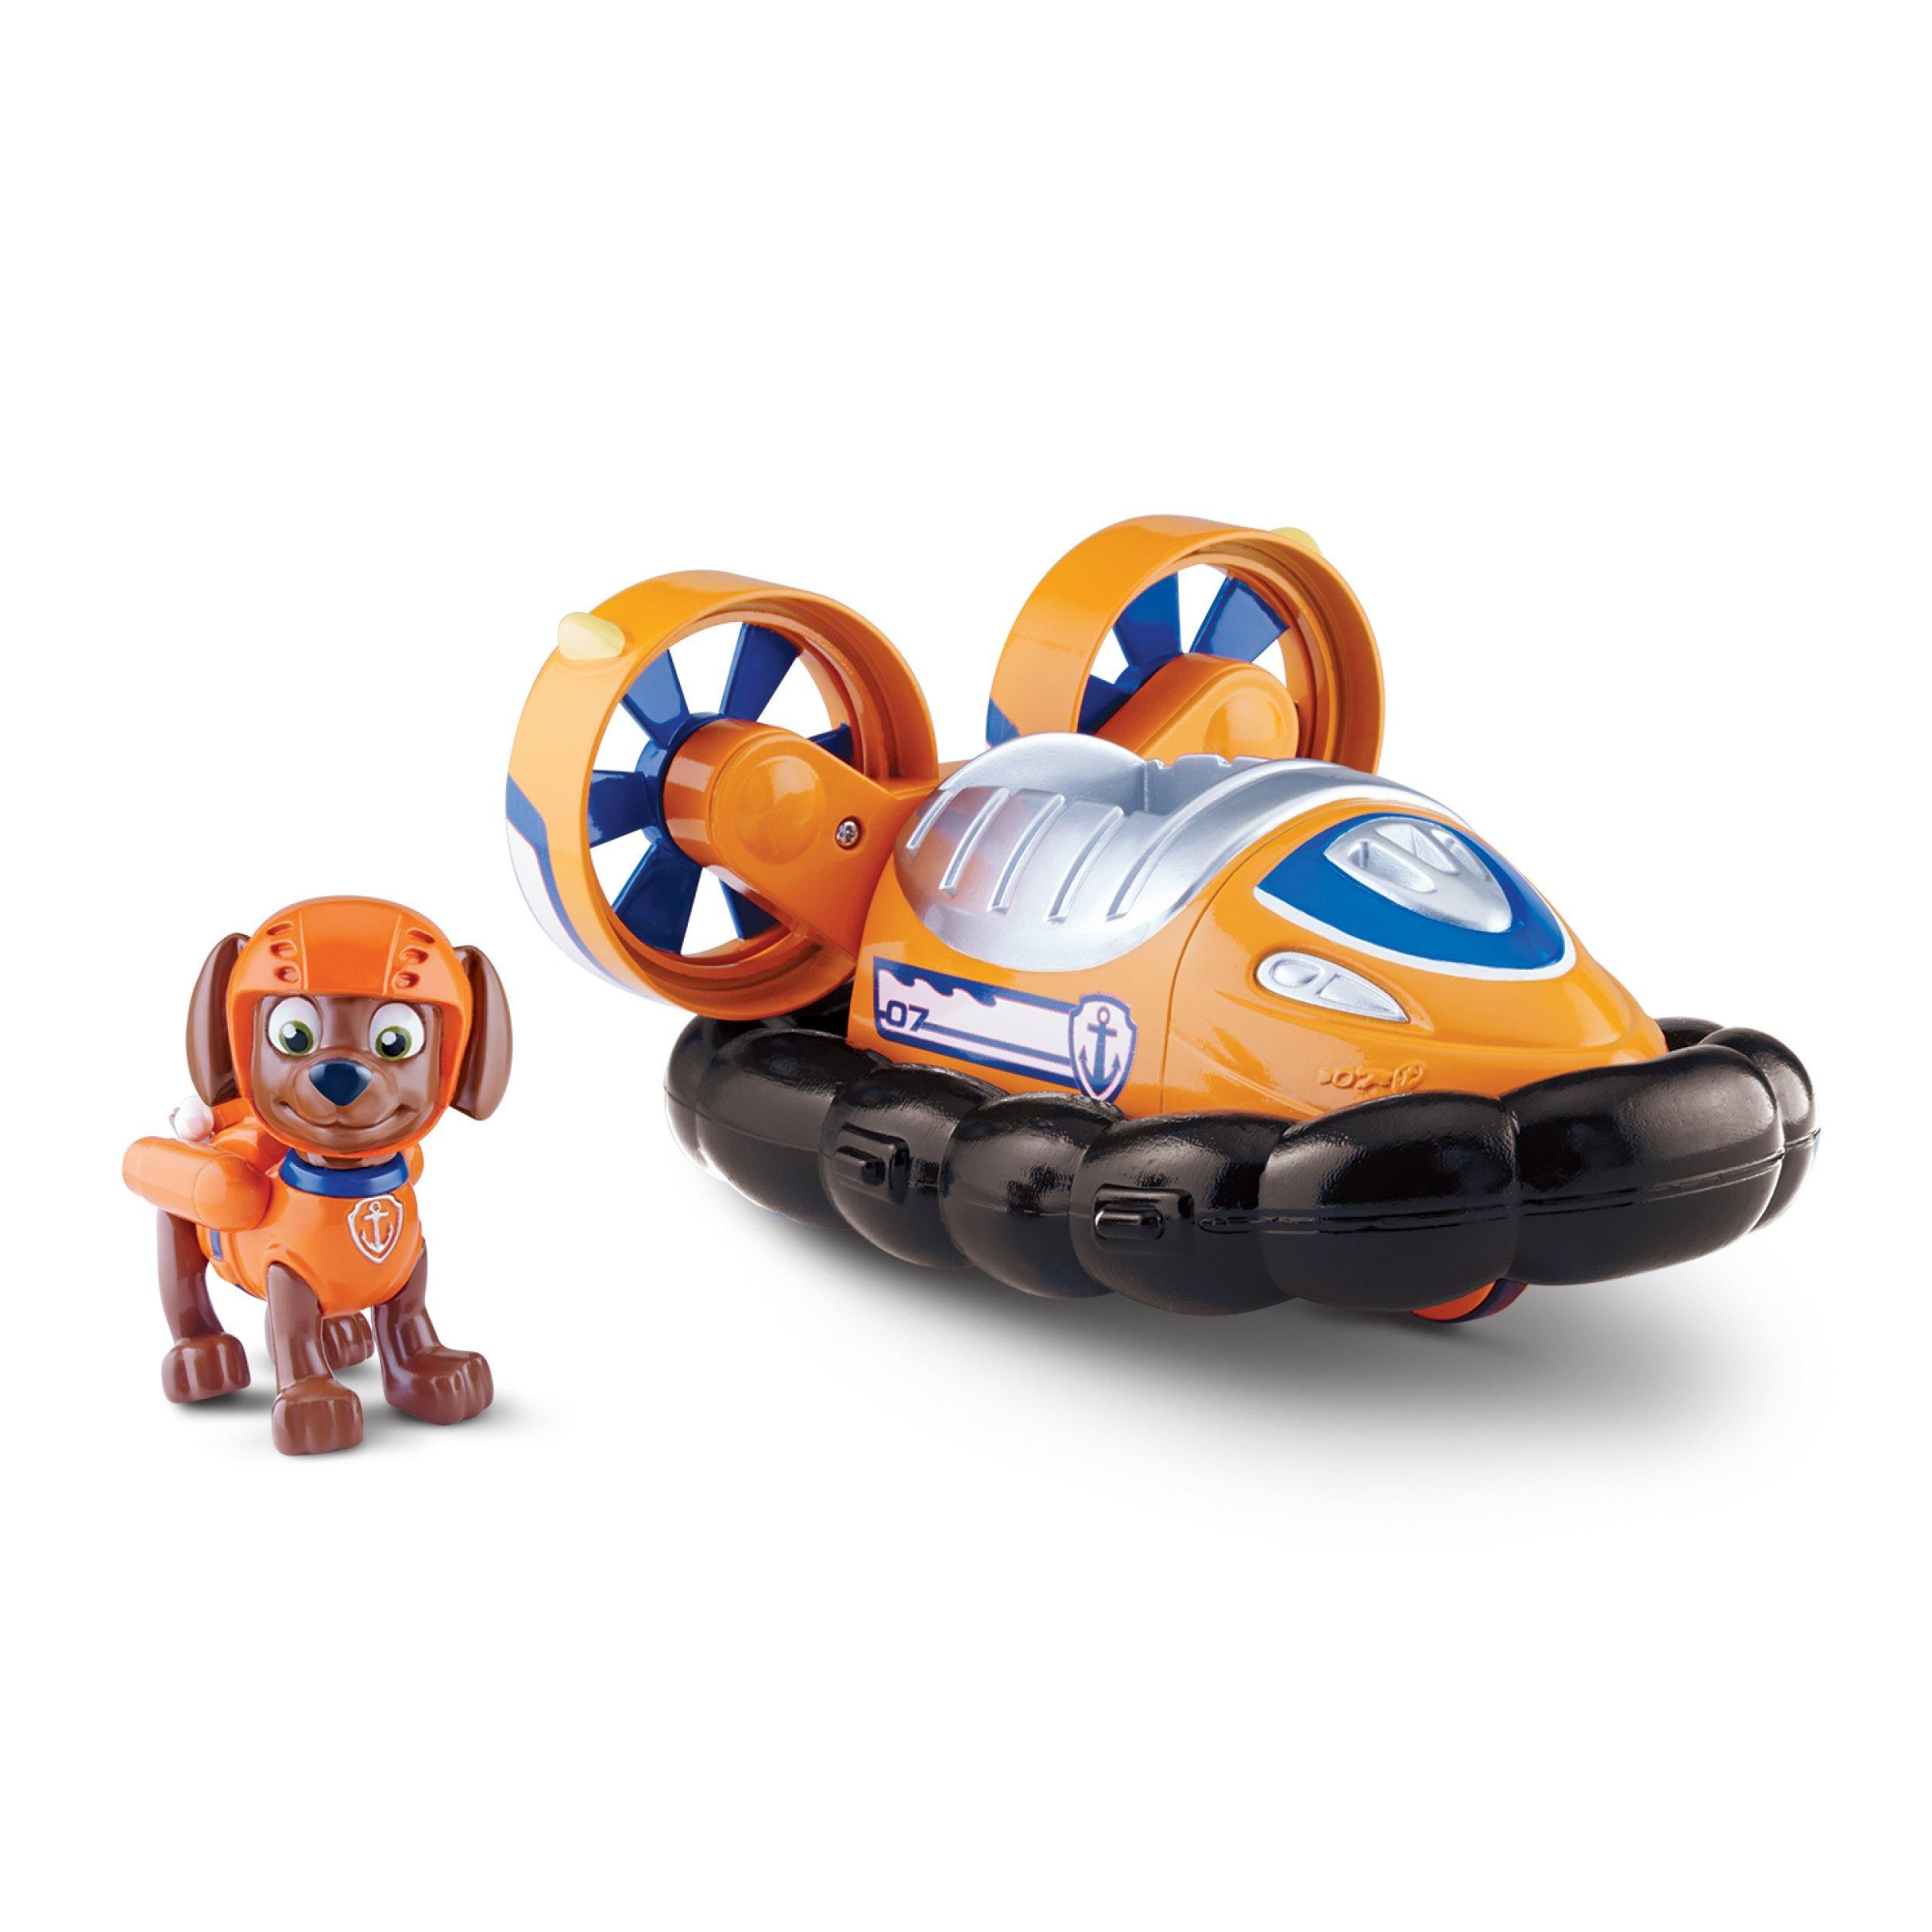 Paw Patrol Zuma's Hovercraft, Vehicle and Figure